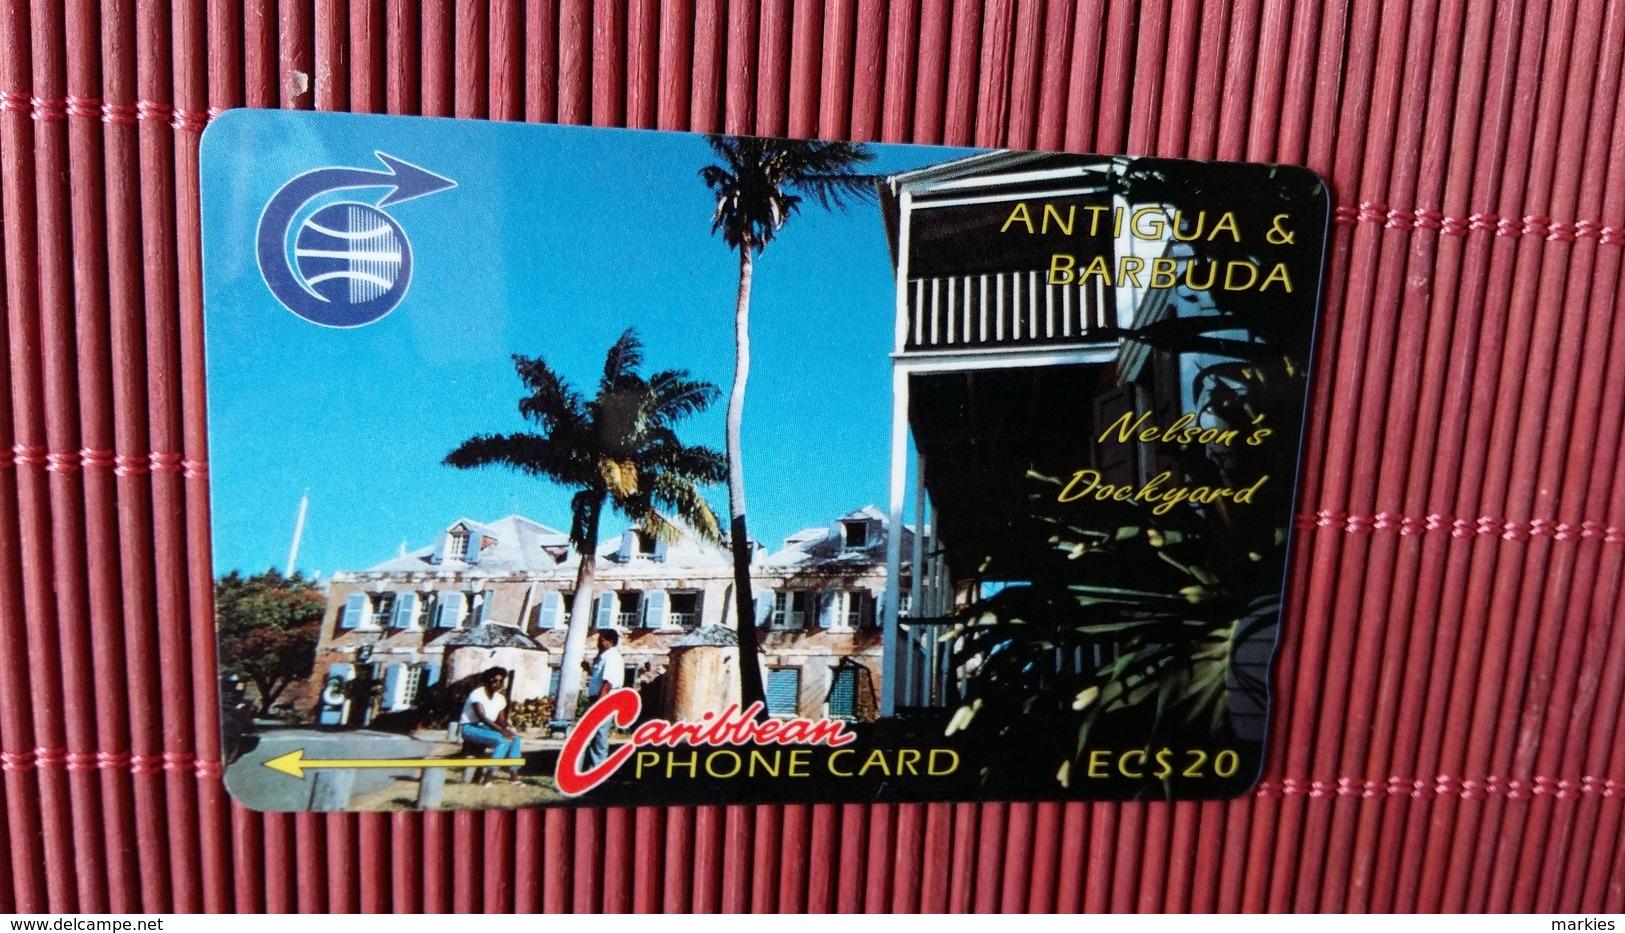 Phonecard Antigua & Barbuda 20 $ Number 4CATB Used Rare - Antigua And Barbuda